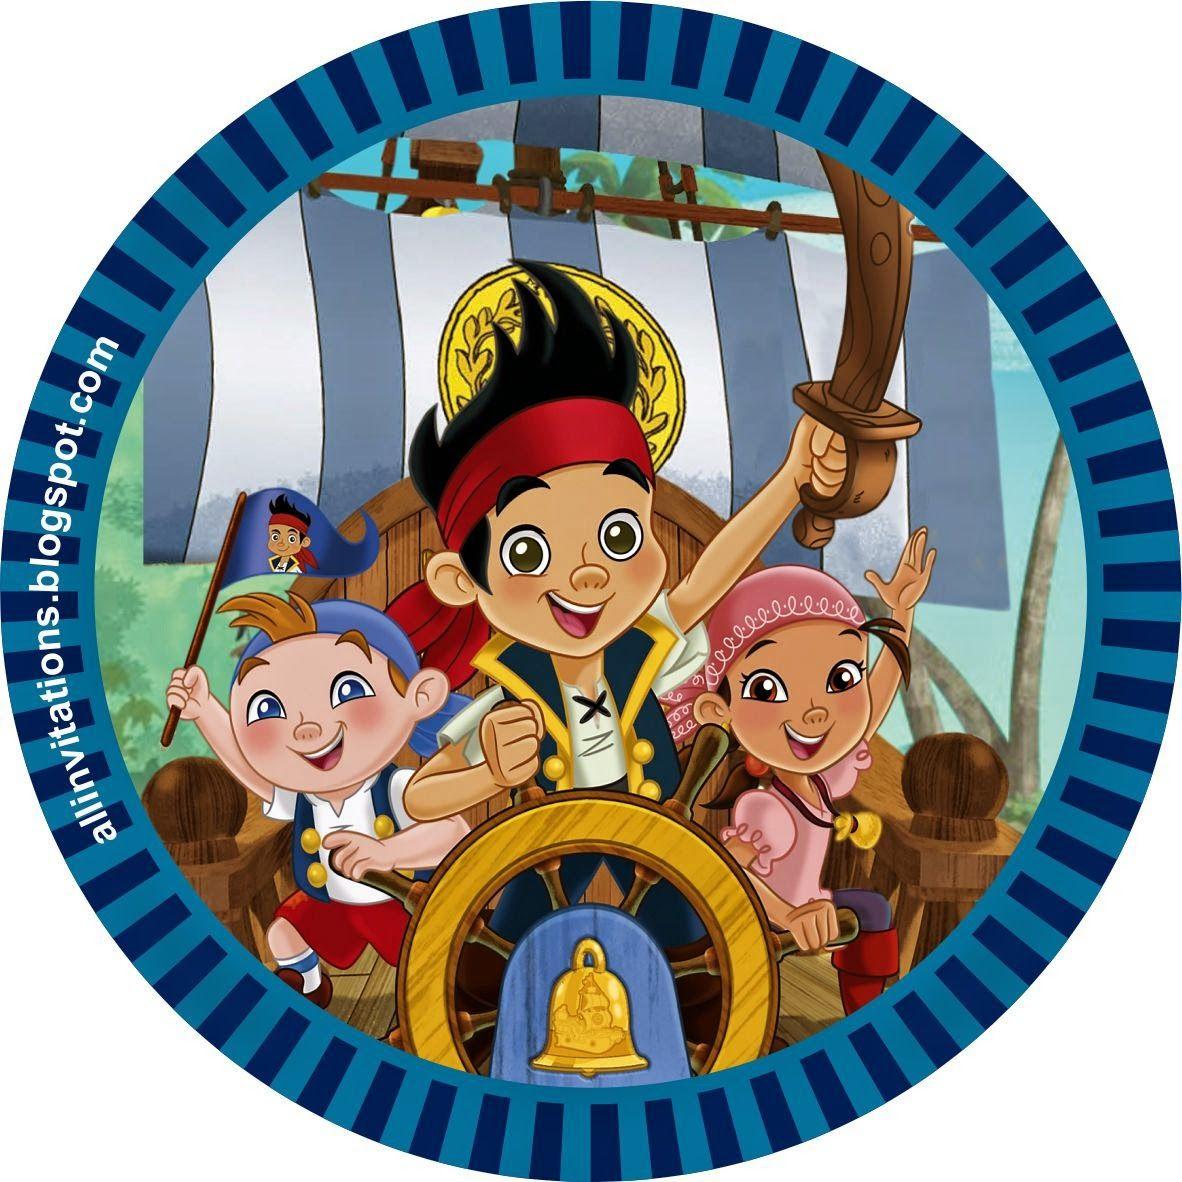 Etiqueta redonda Jake y los piratas | etiquetas | Pinterest ...